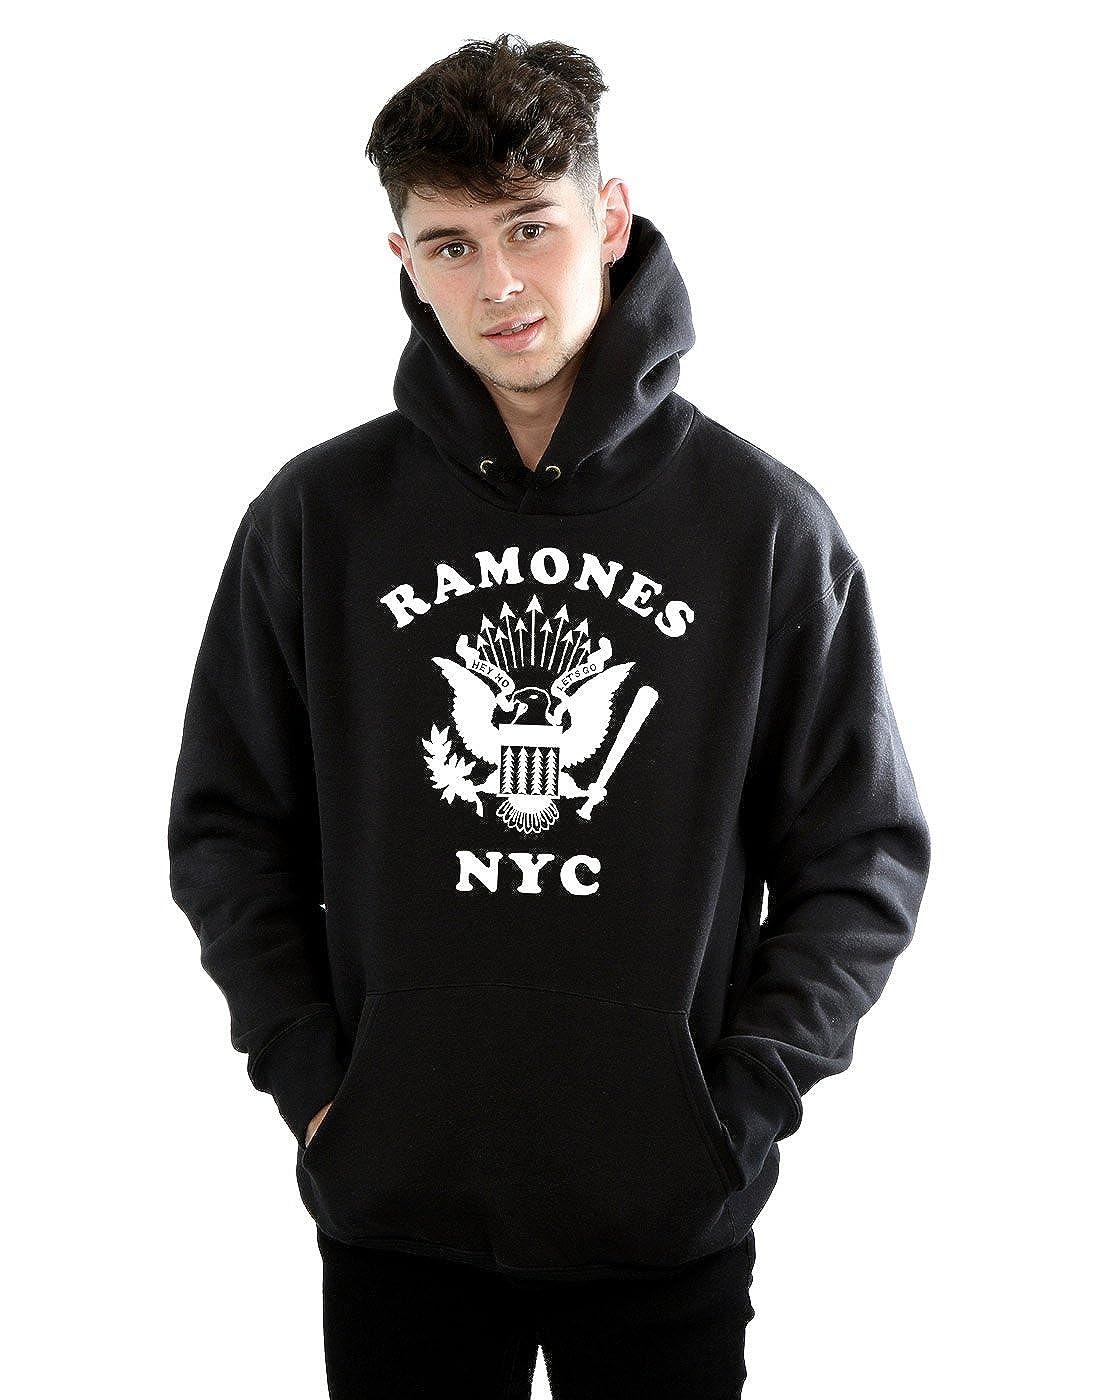 Ramones Herren Retro Eagle NYC Kapuzenpullover